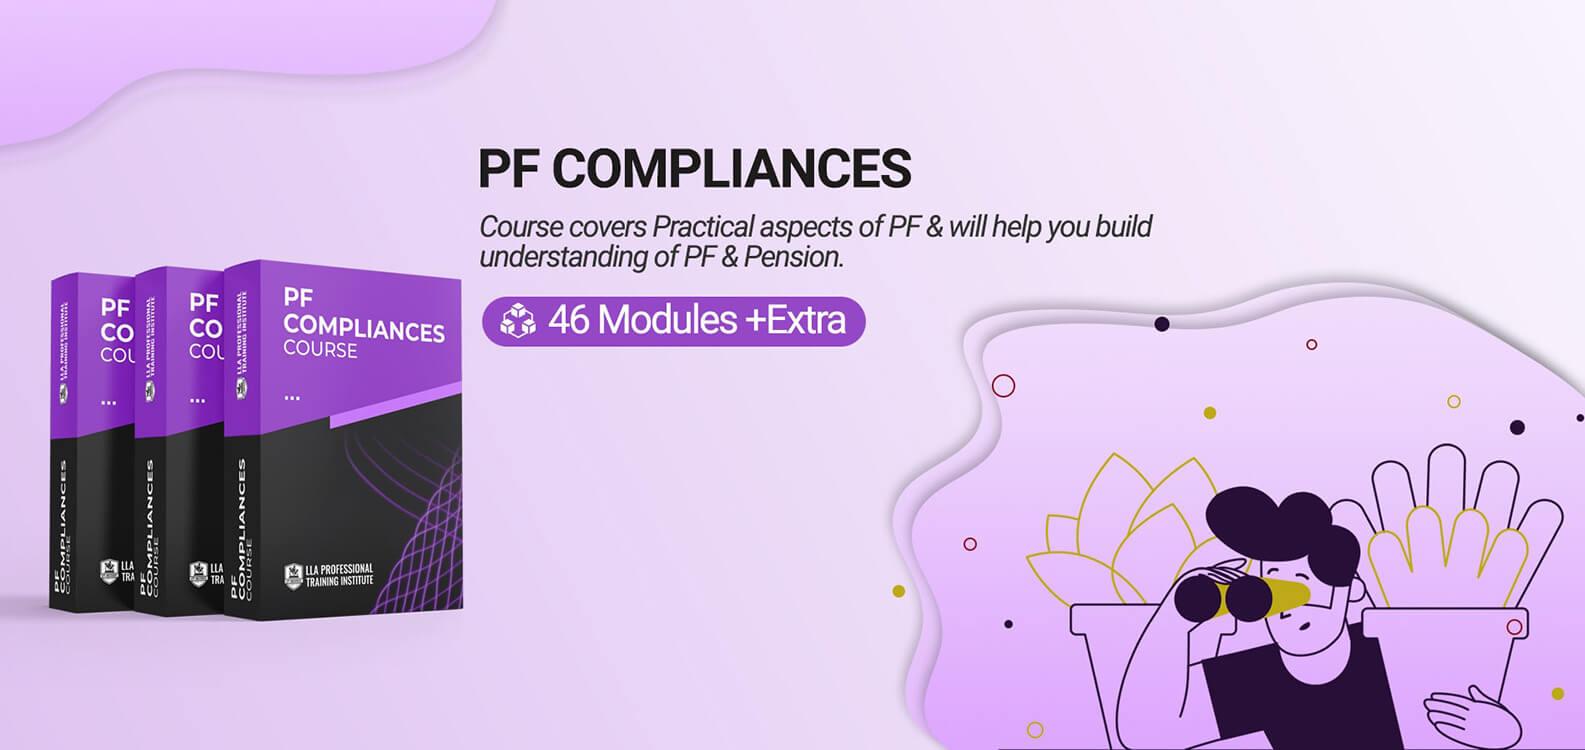 PF compliance